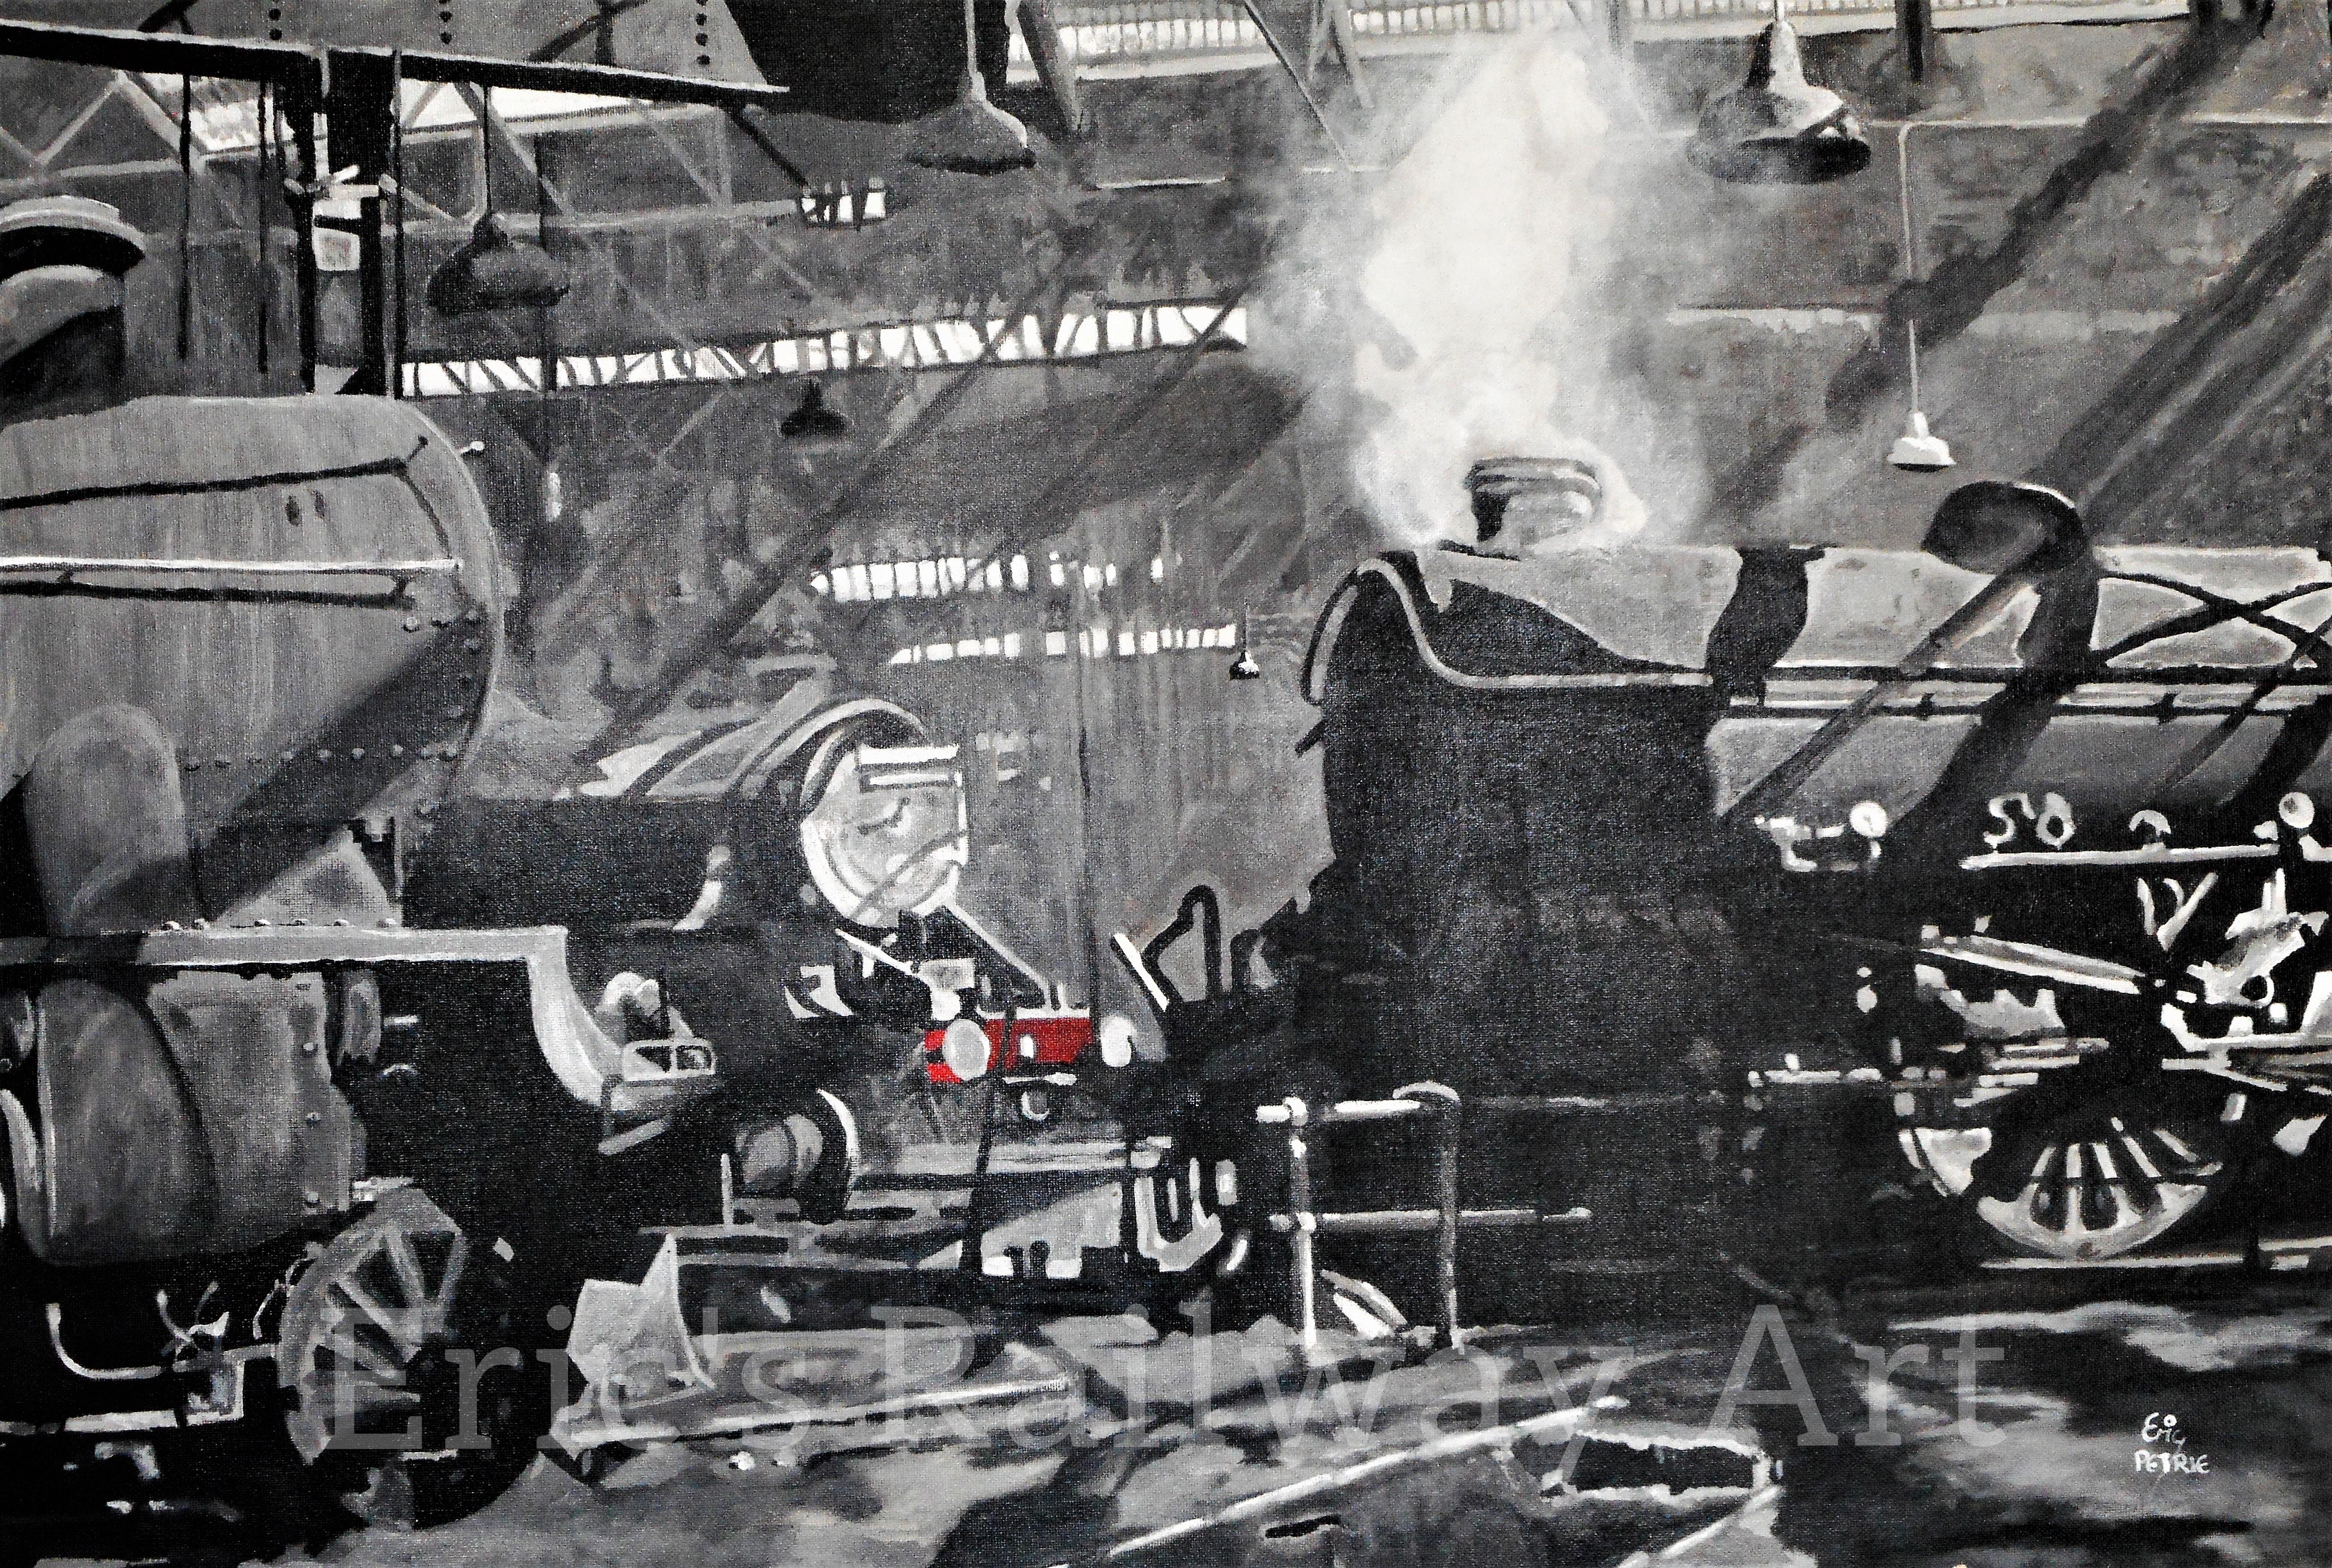 Eric's Railway Art - In the Shadows